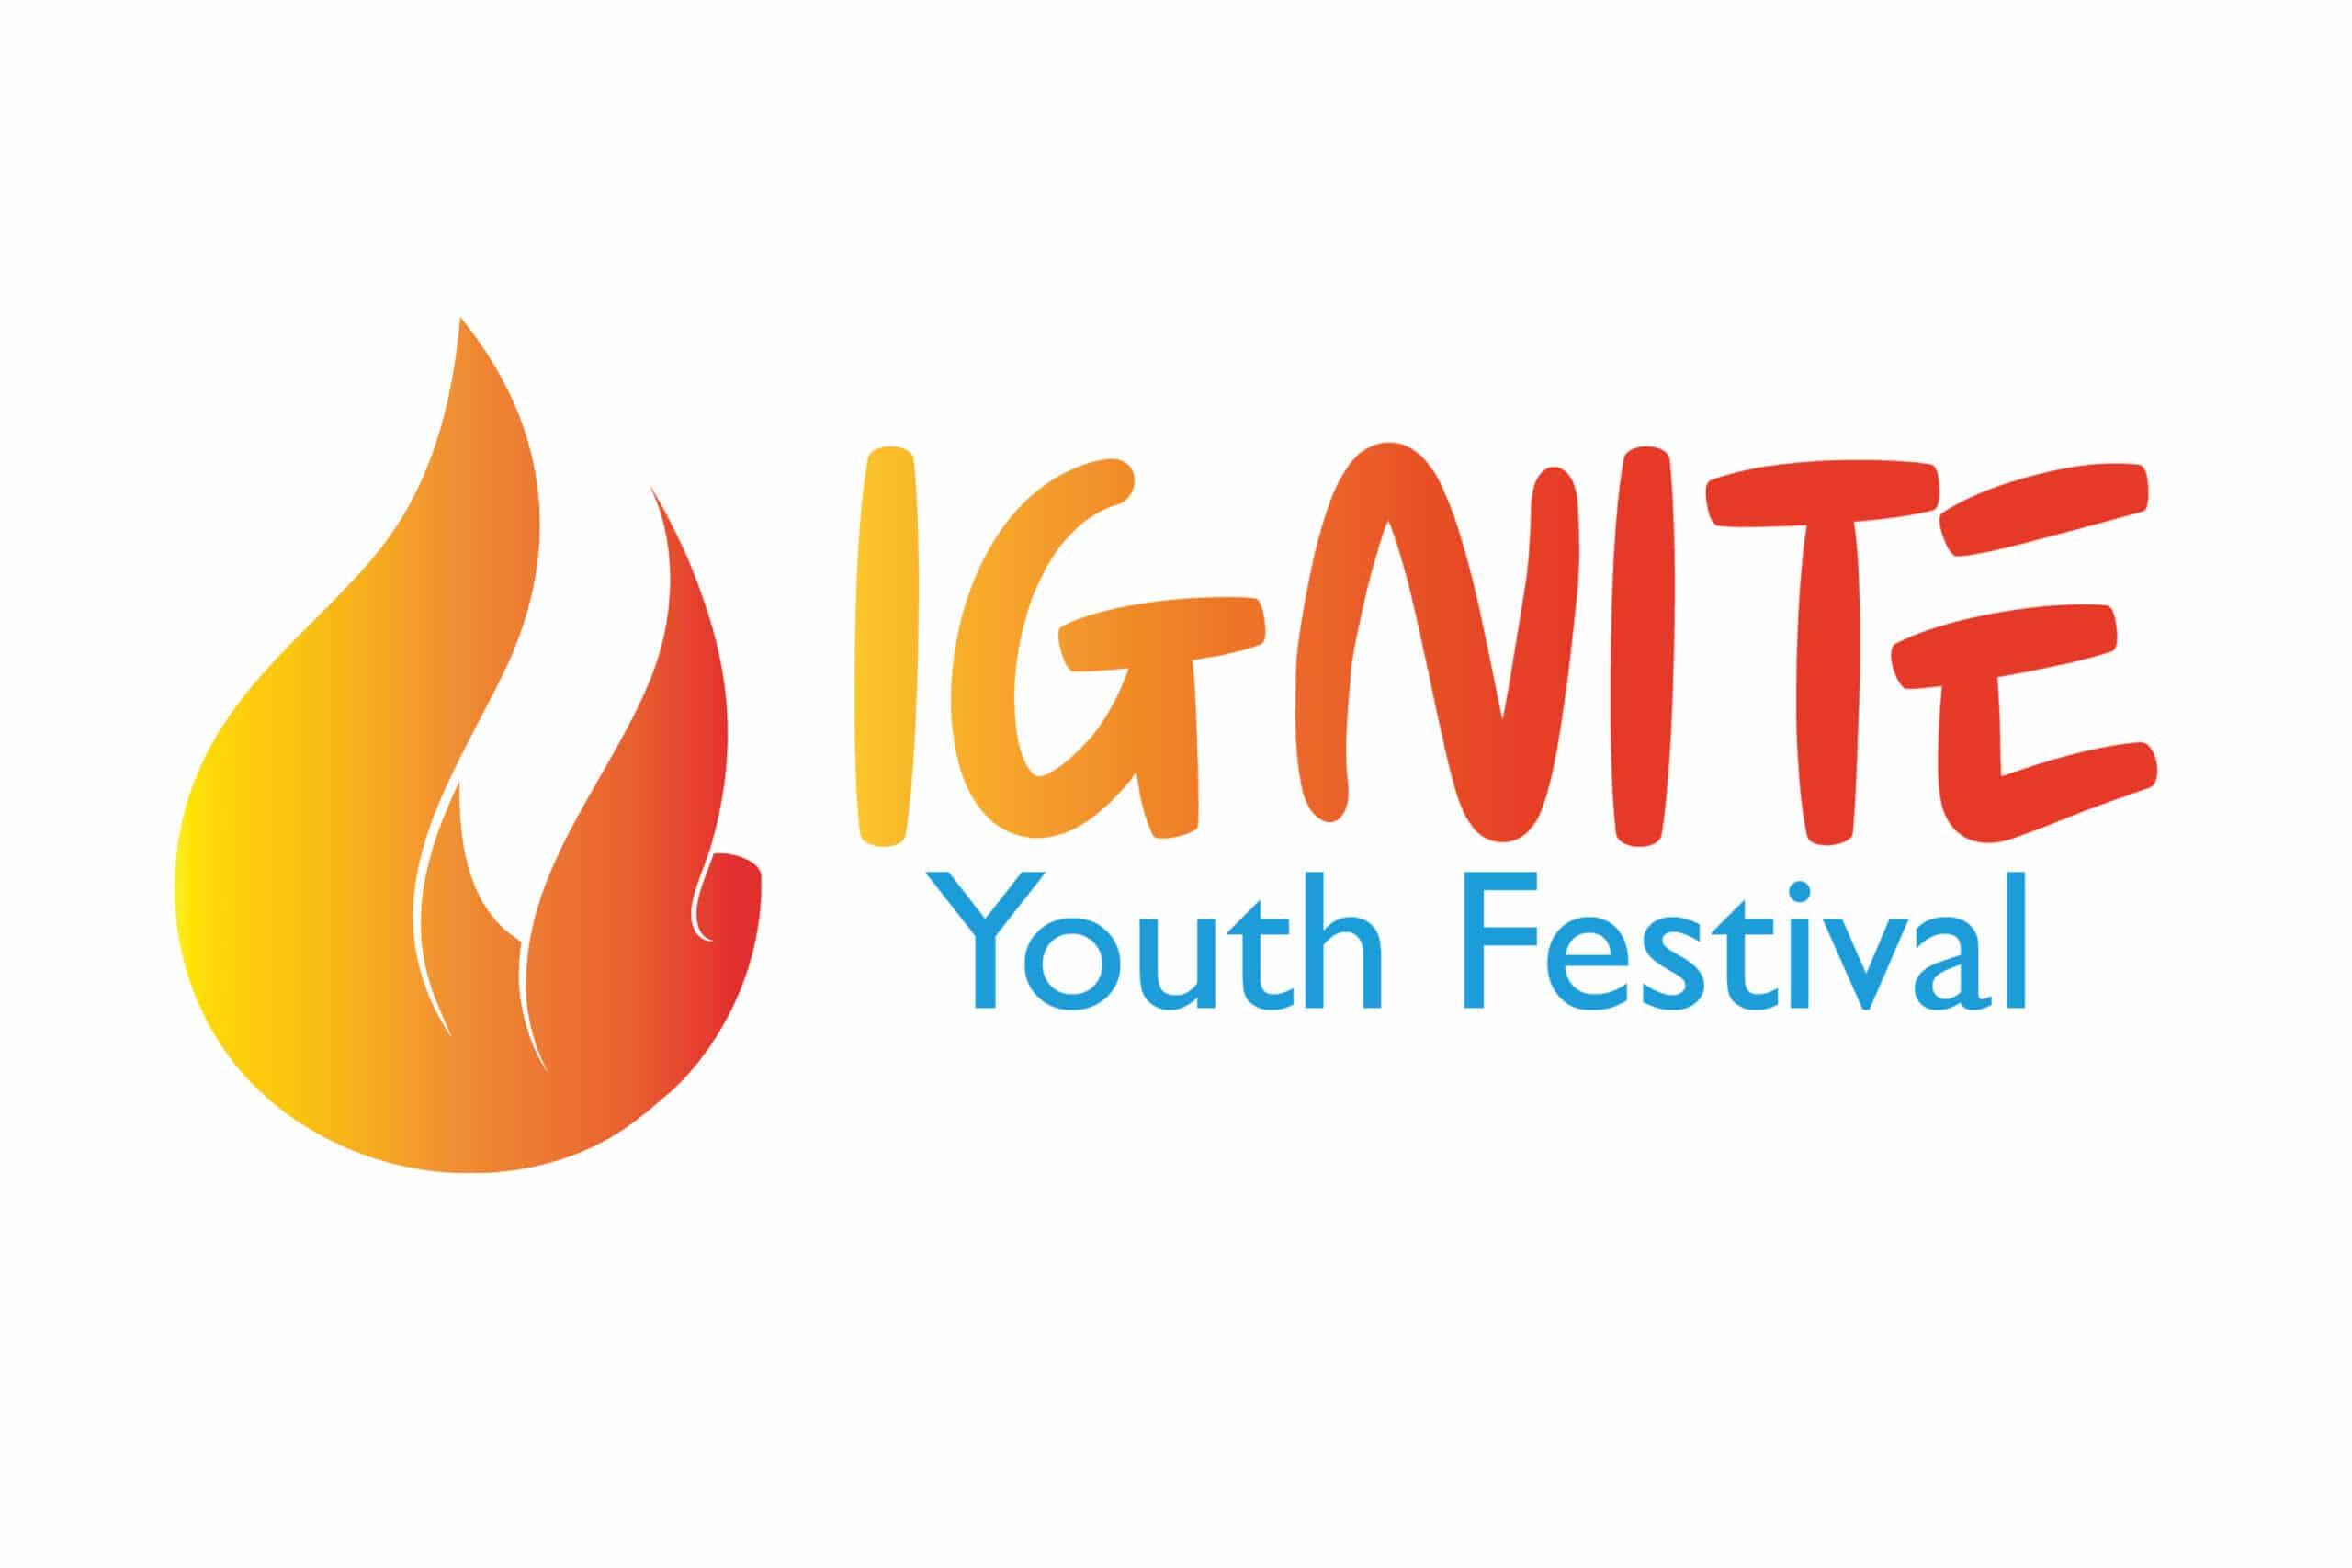 Ignite Youth Festival